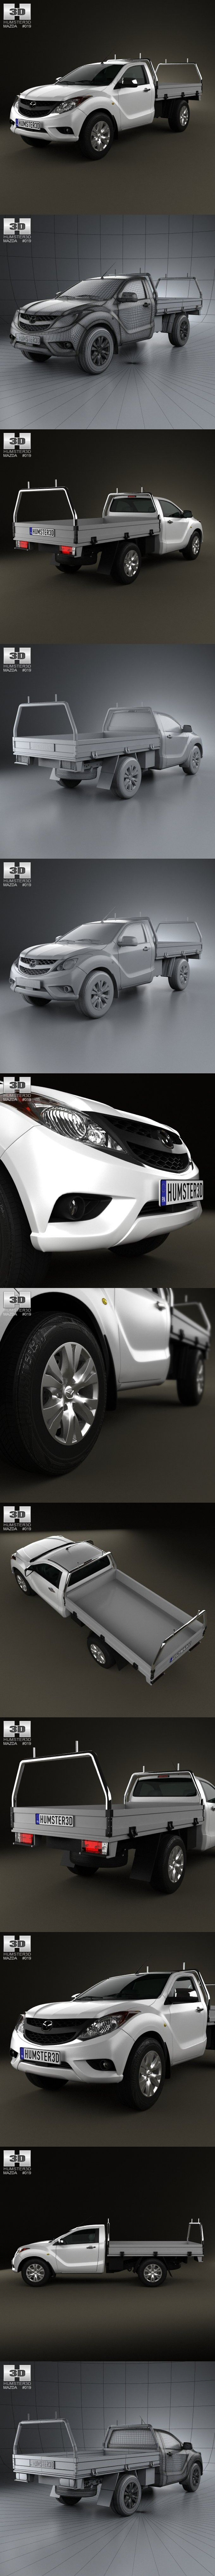 Mazda BT-50 Single Cab 2012. 3D Vehicles